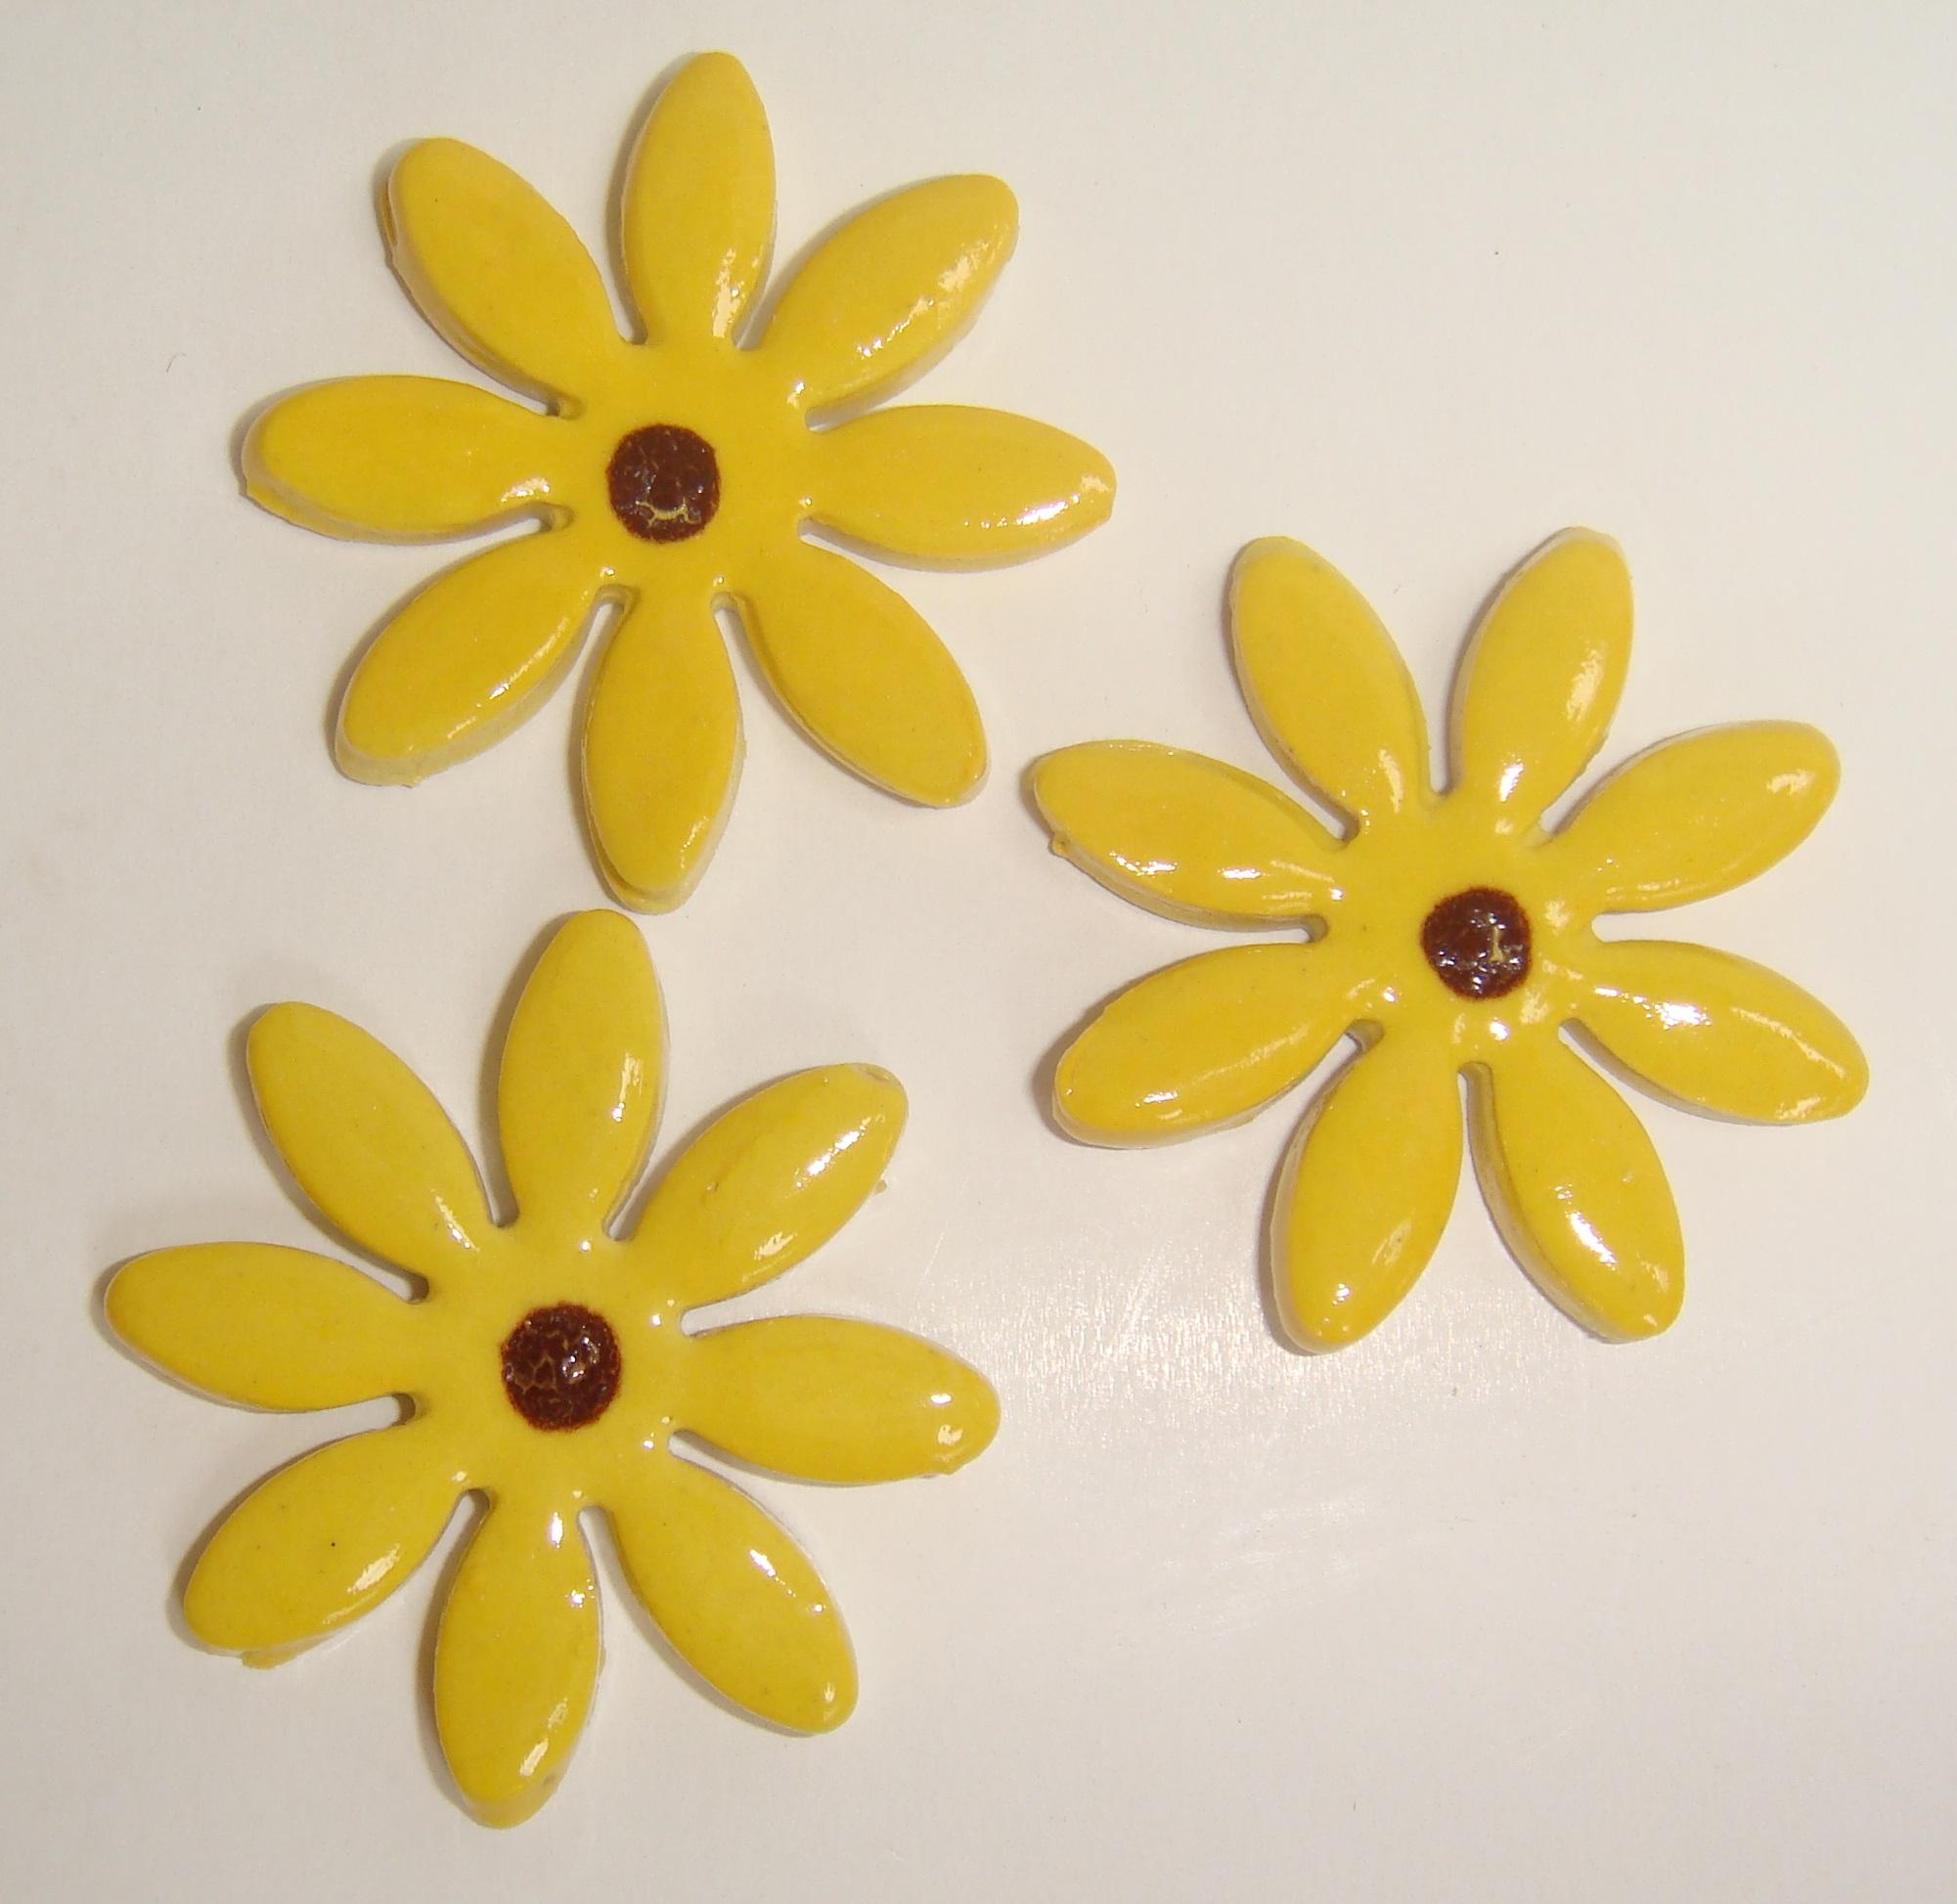 FLO-002 Daisy Large Yellow